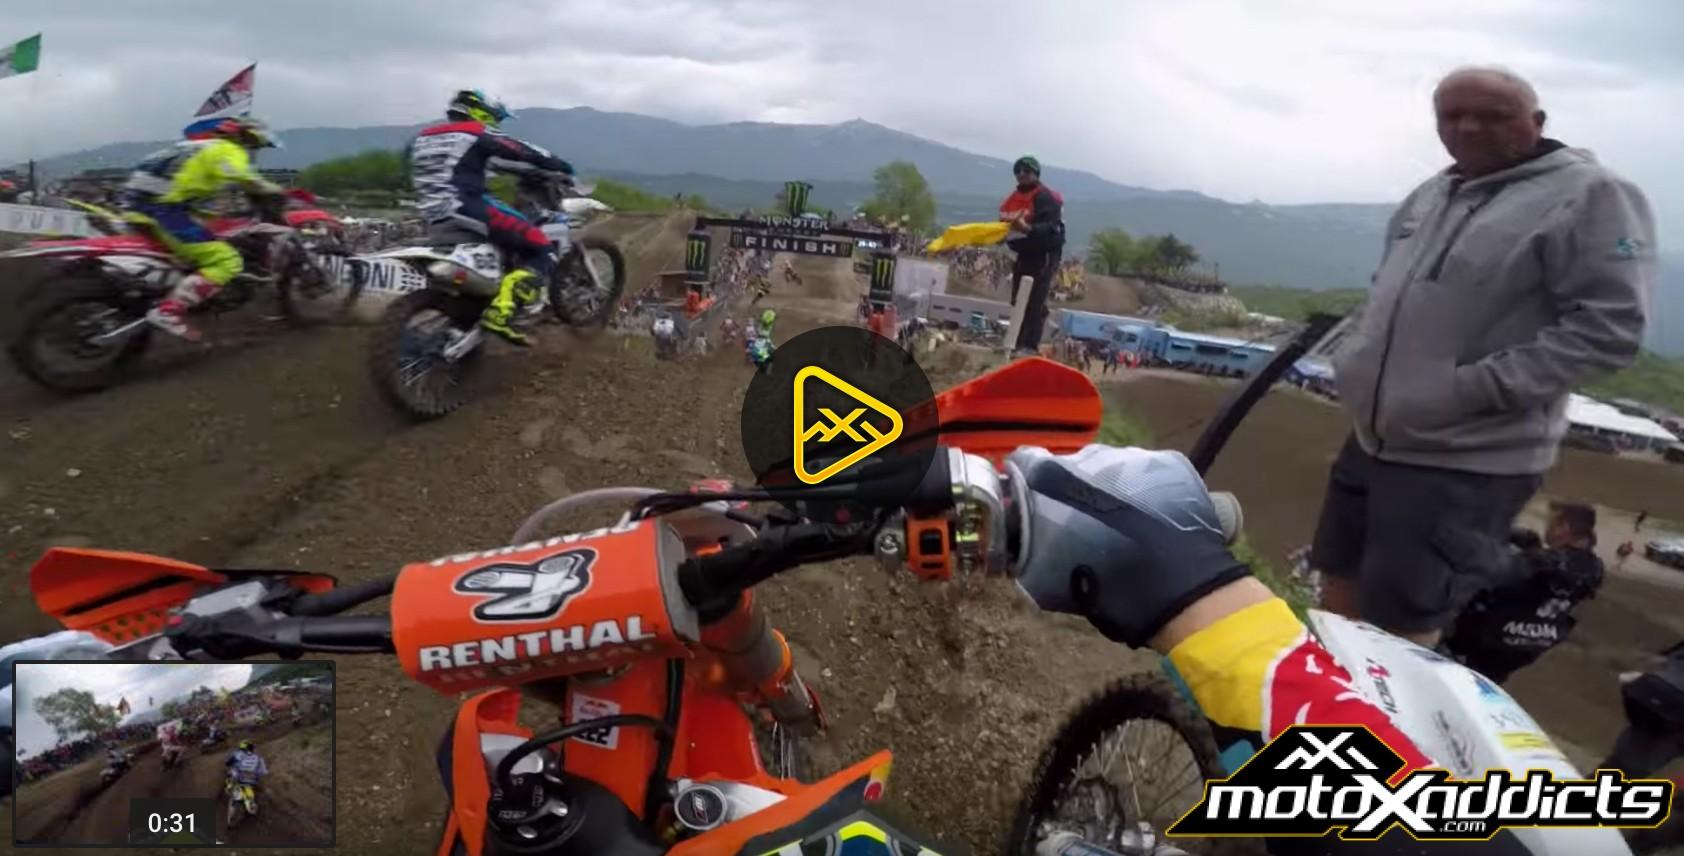 GoPro: Antonio Cairoli Charge from Back in Trentino